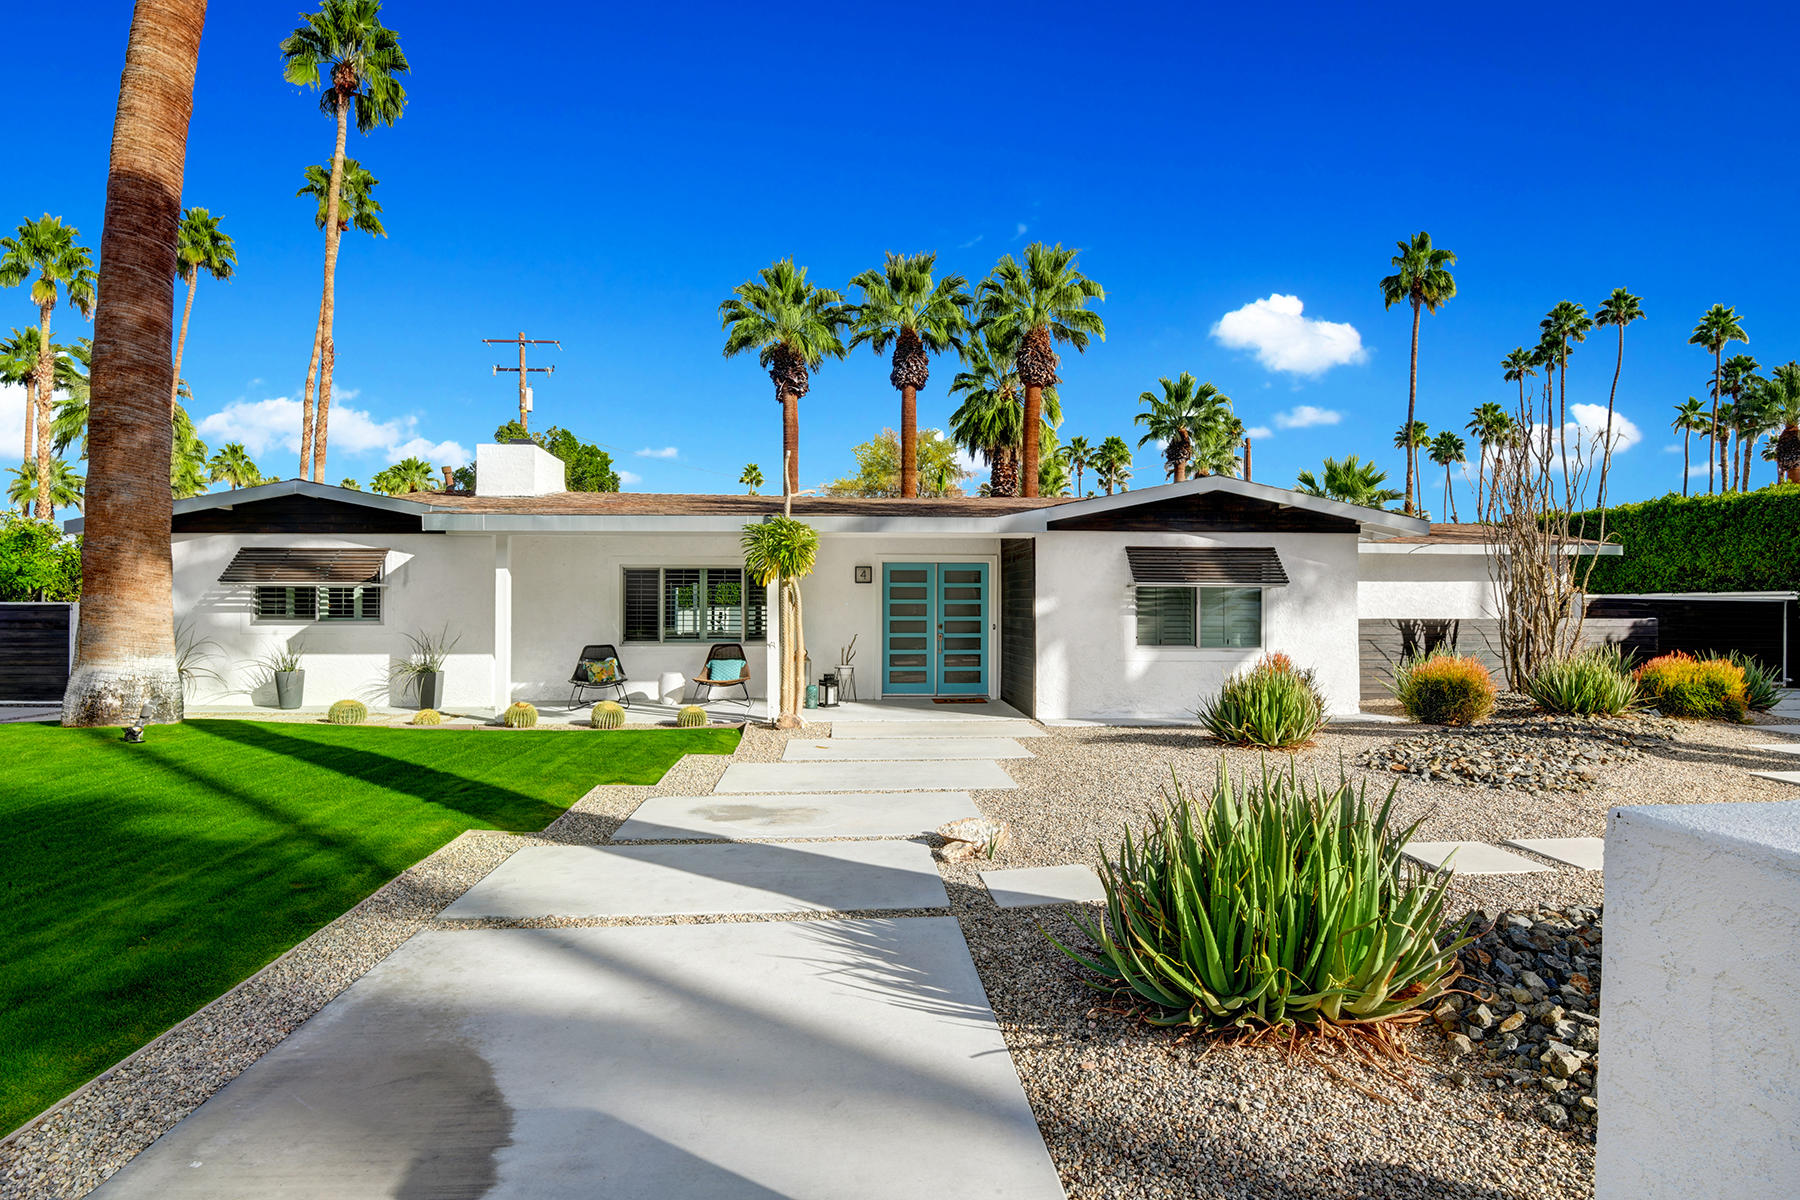 Photo of 4 Palomino Road, Palm Springs, CA 92264